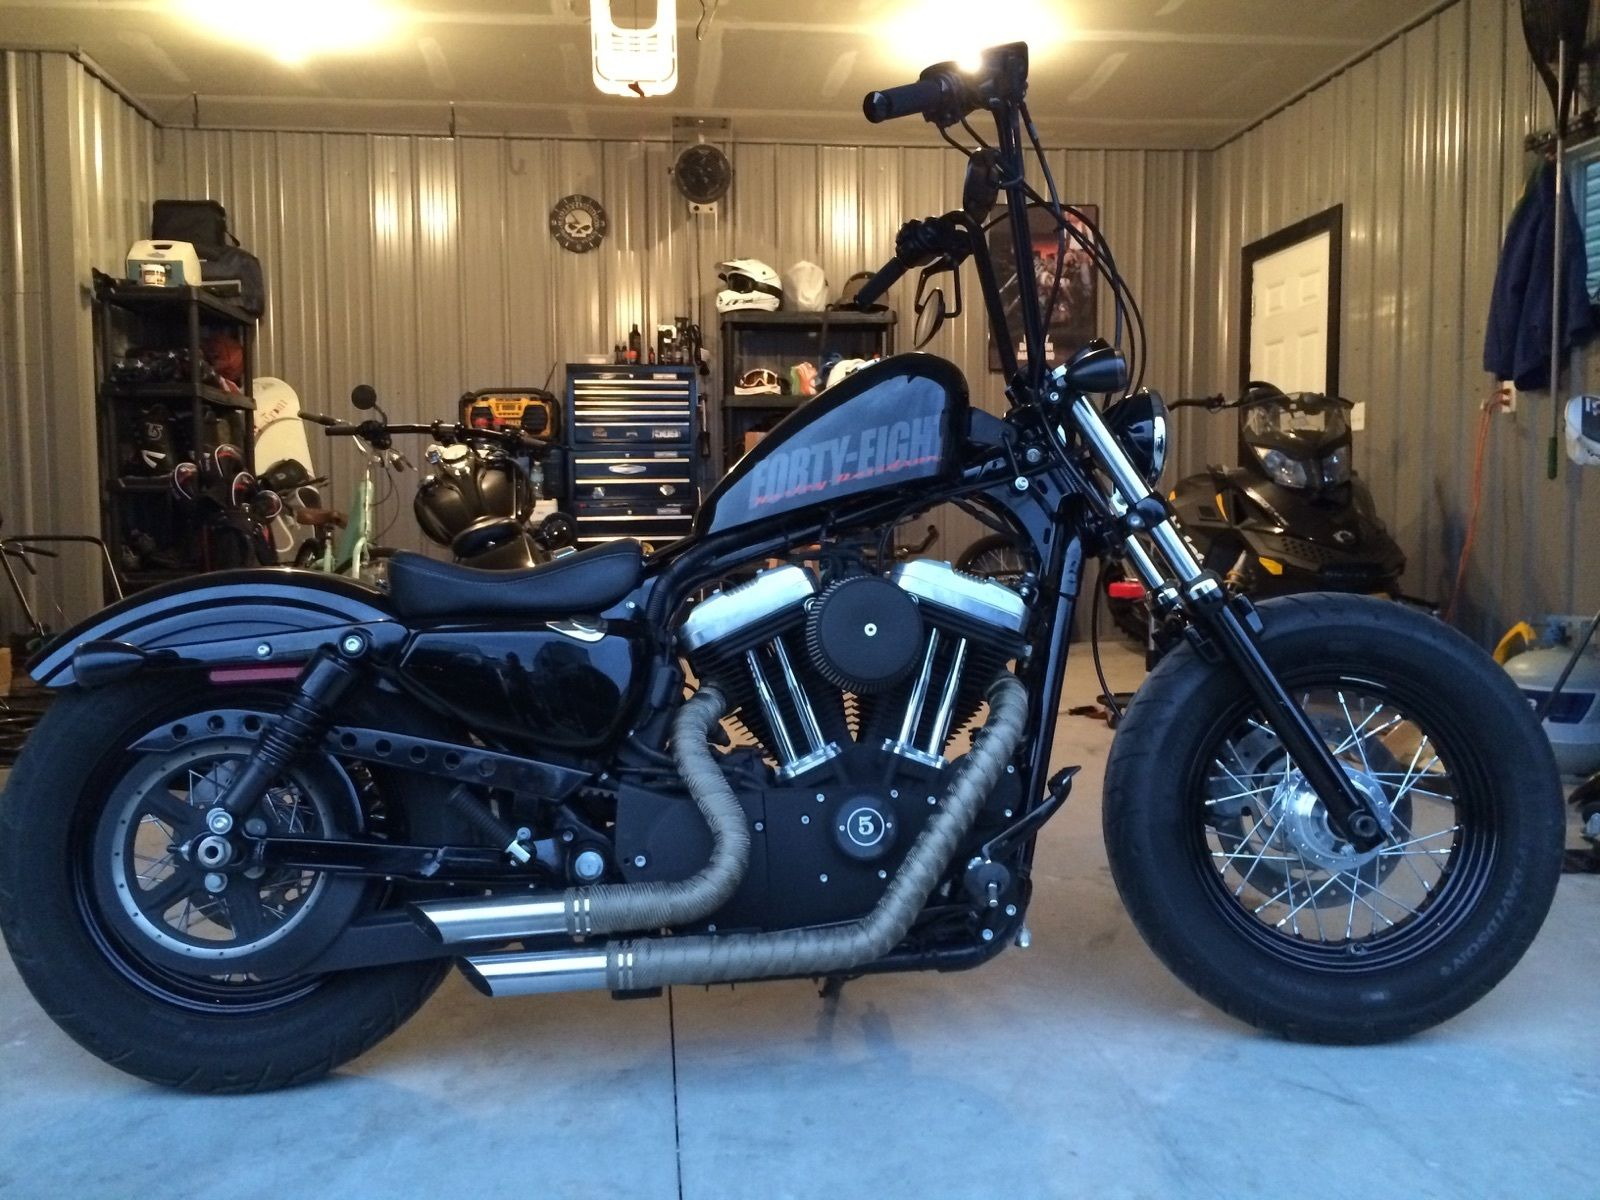 2012 Harley Davidson Sportster 48